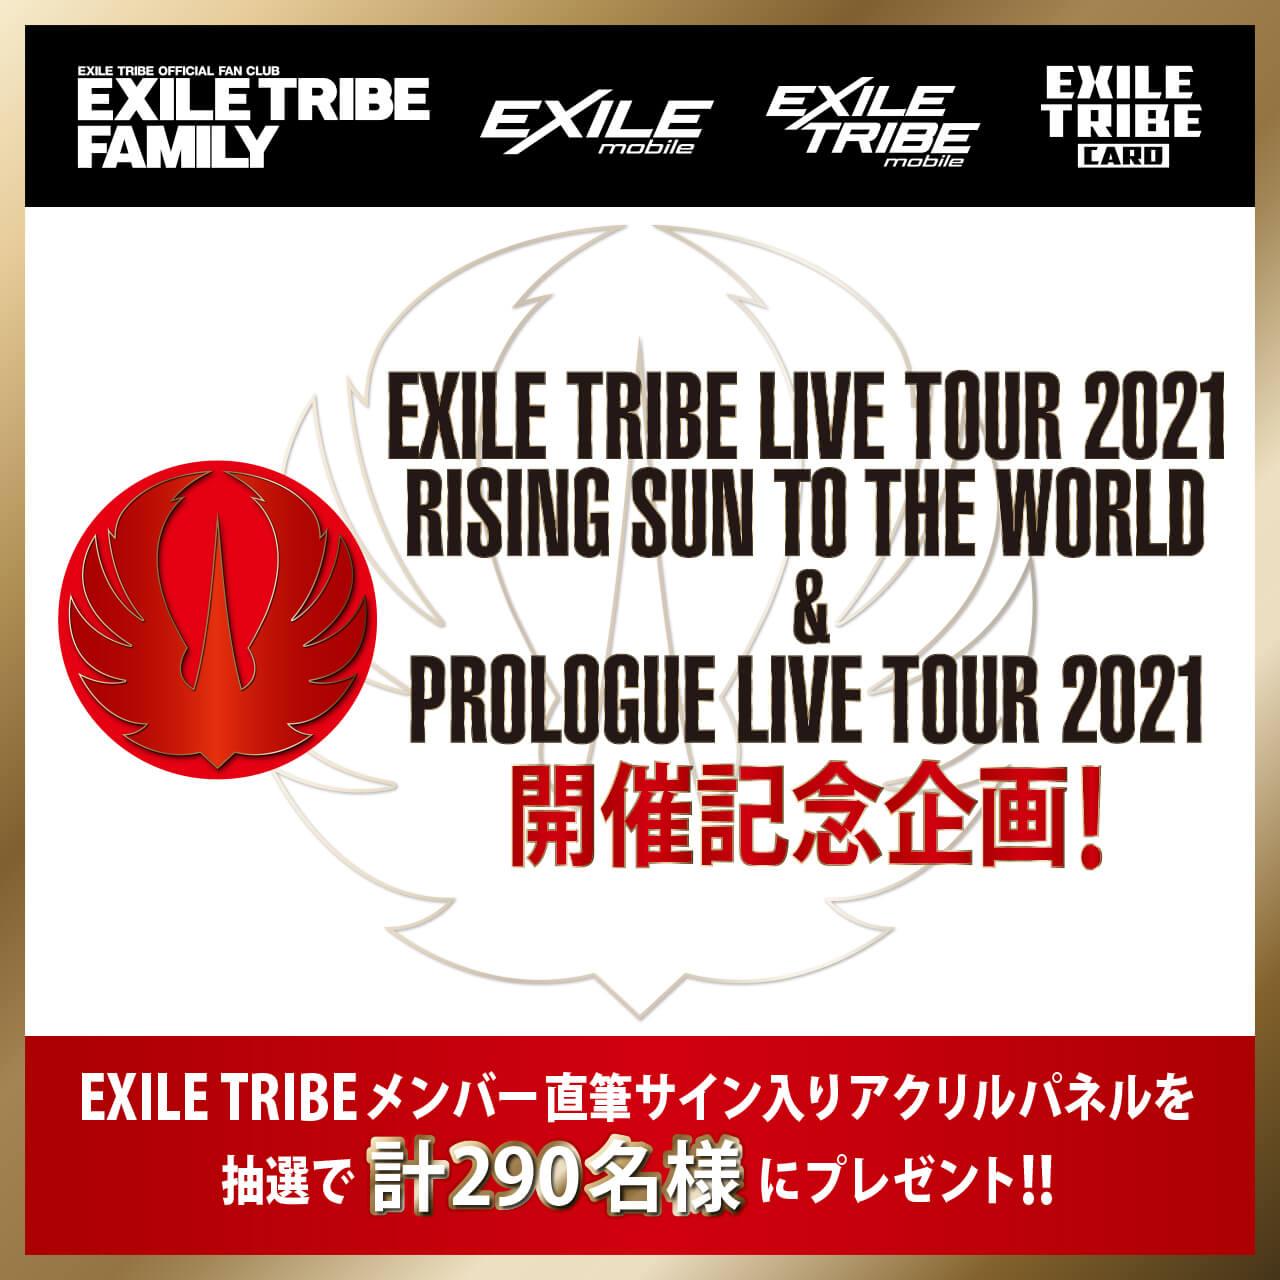 EXILE TRIBE LIVE TOUR 2021 RISING SUN TO THE WORLD & PROLOGUE LIVE TOUR 2021 開催記念企画